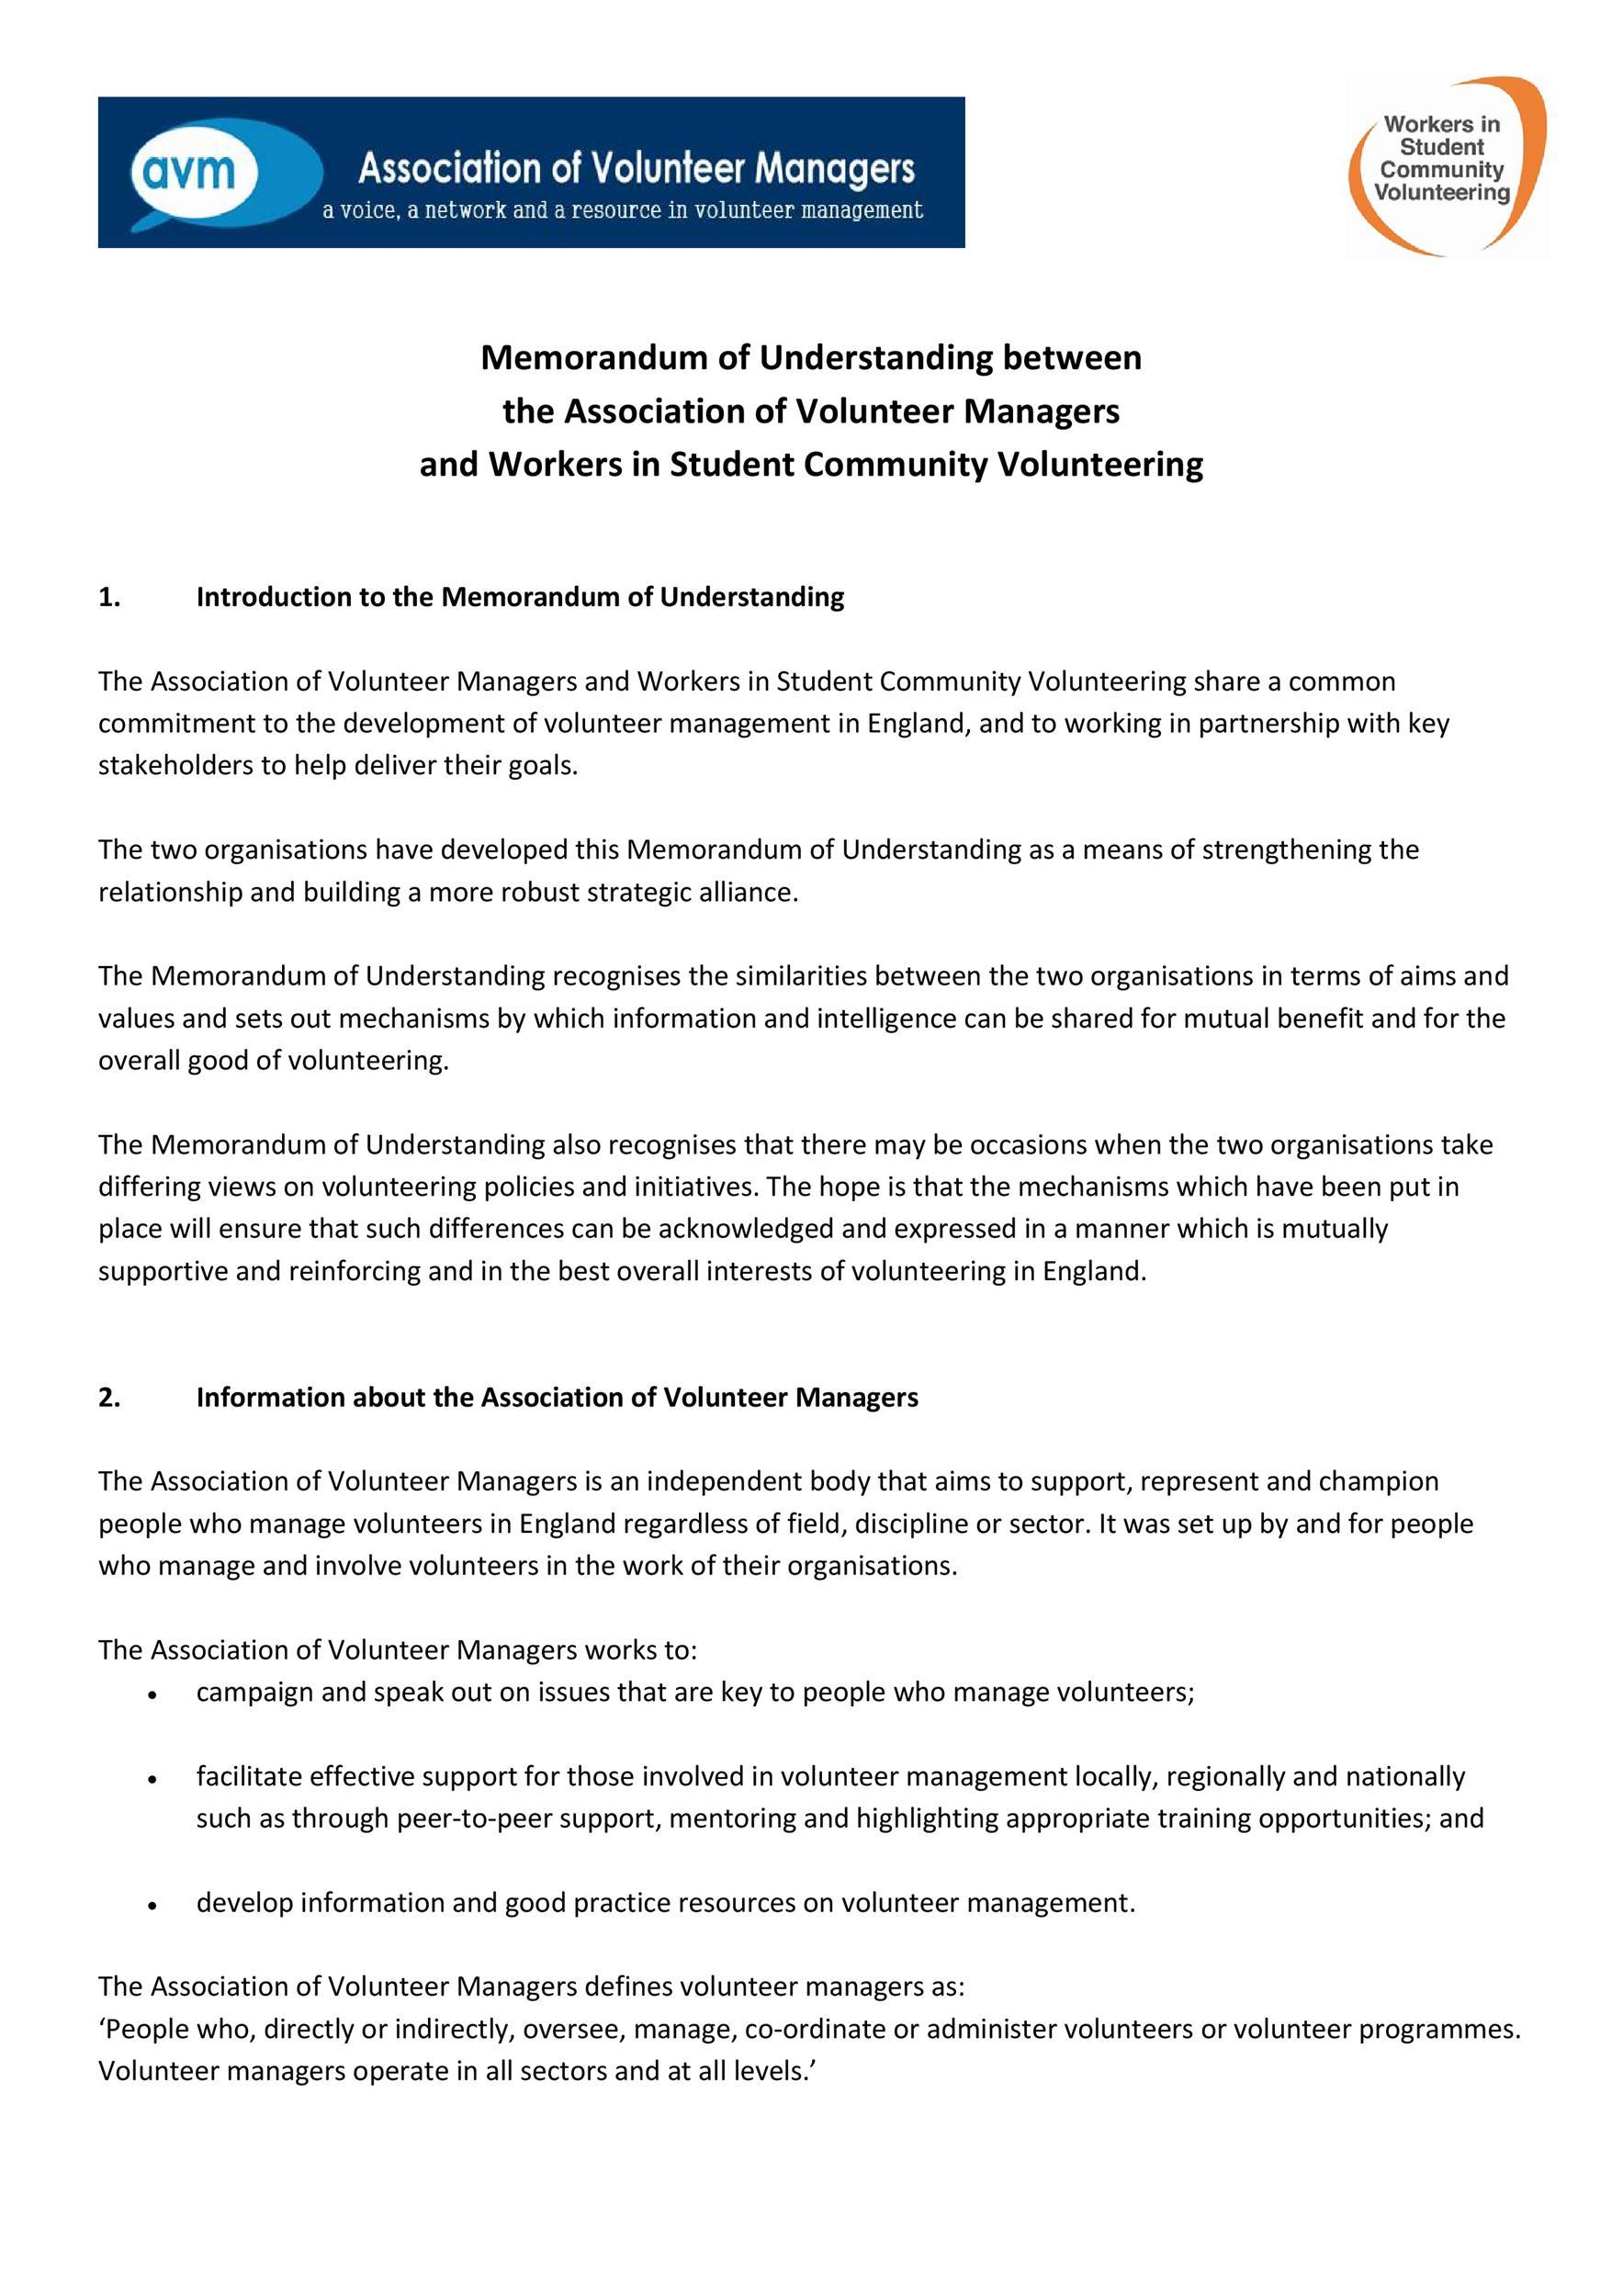 Free Memorandum of Understanding Template 46